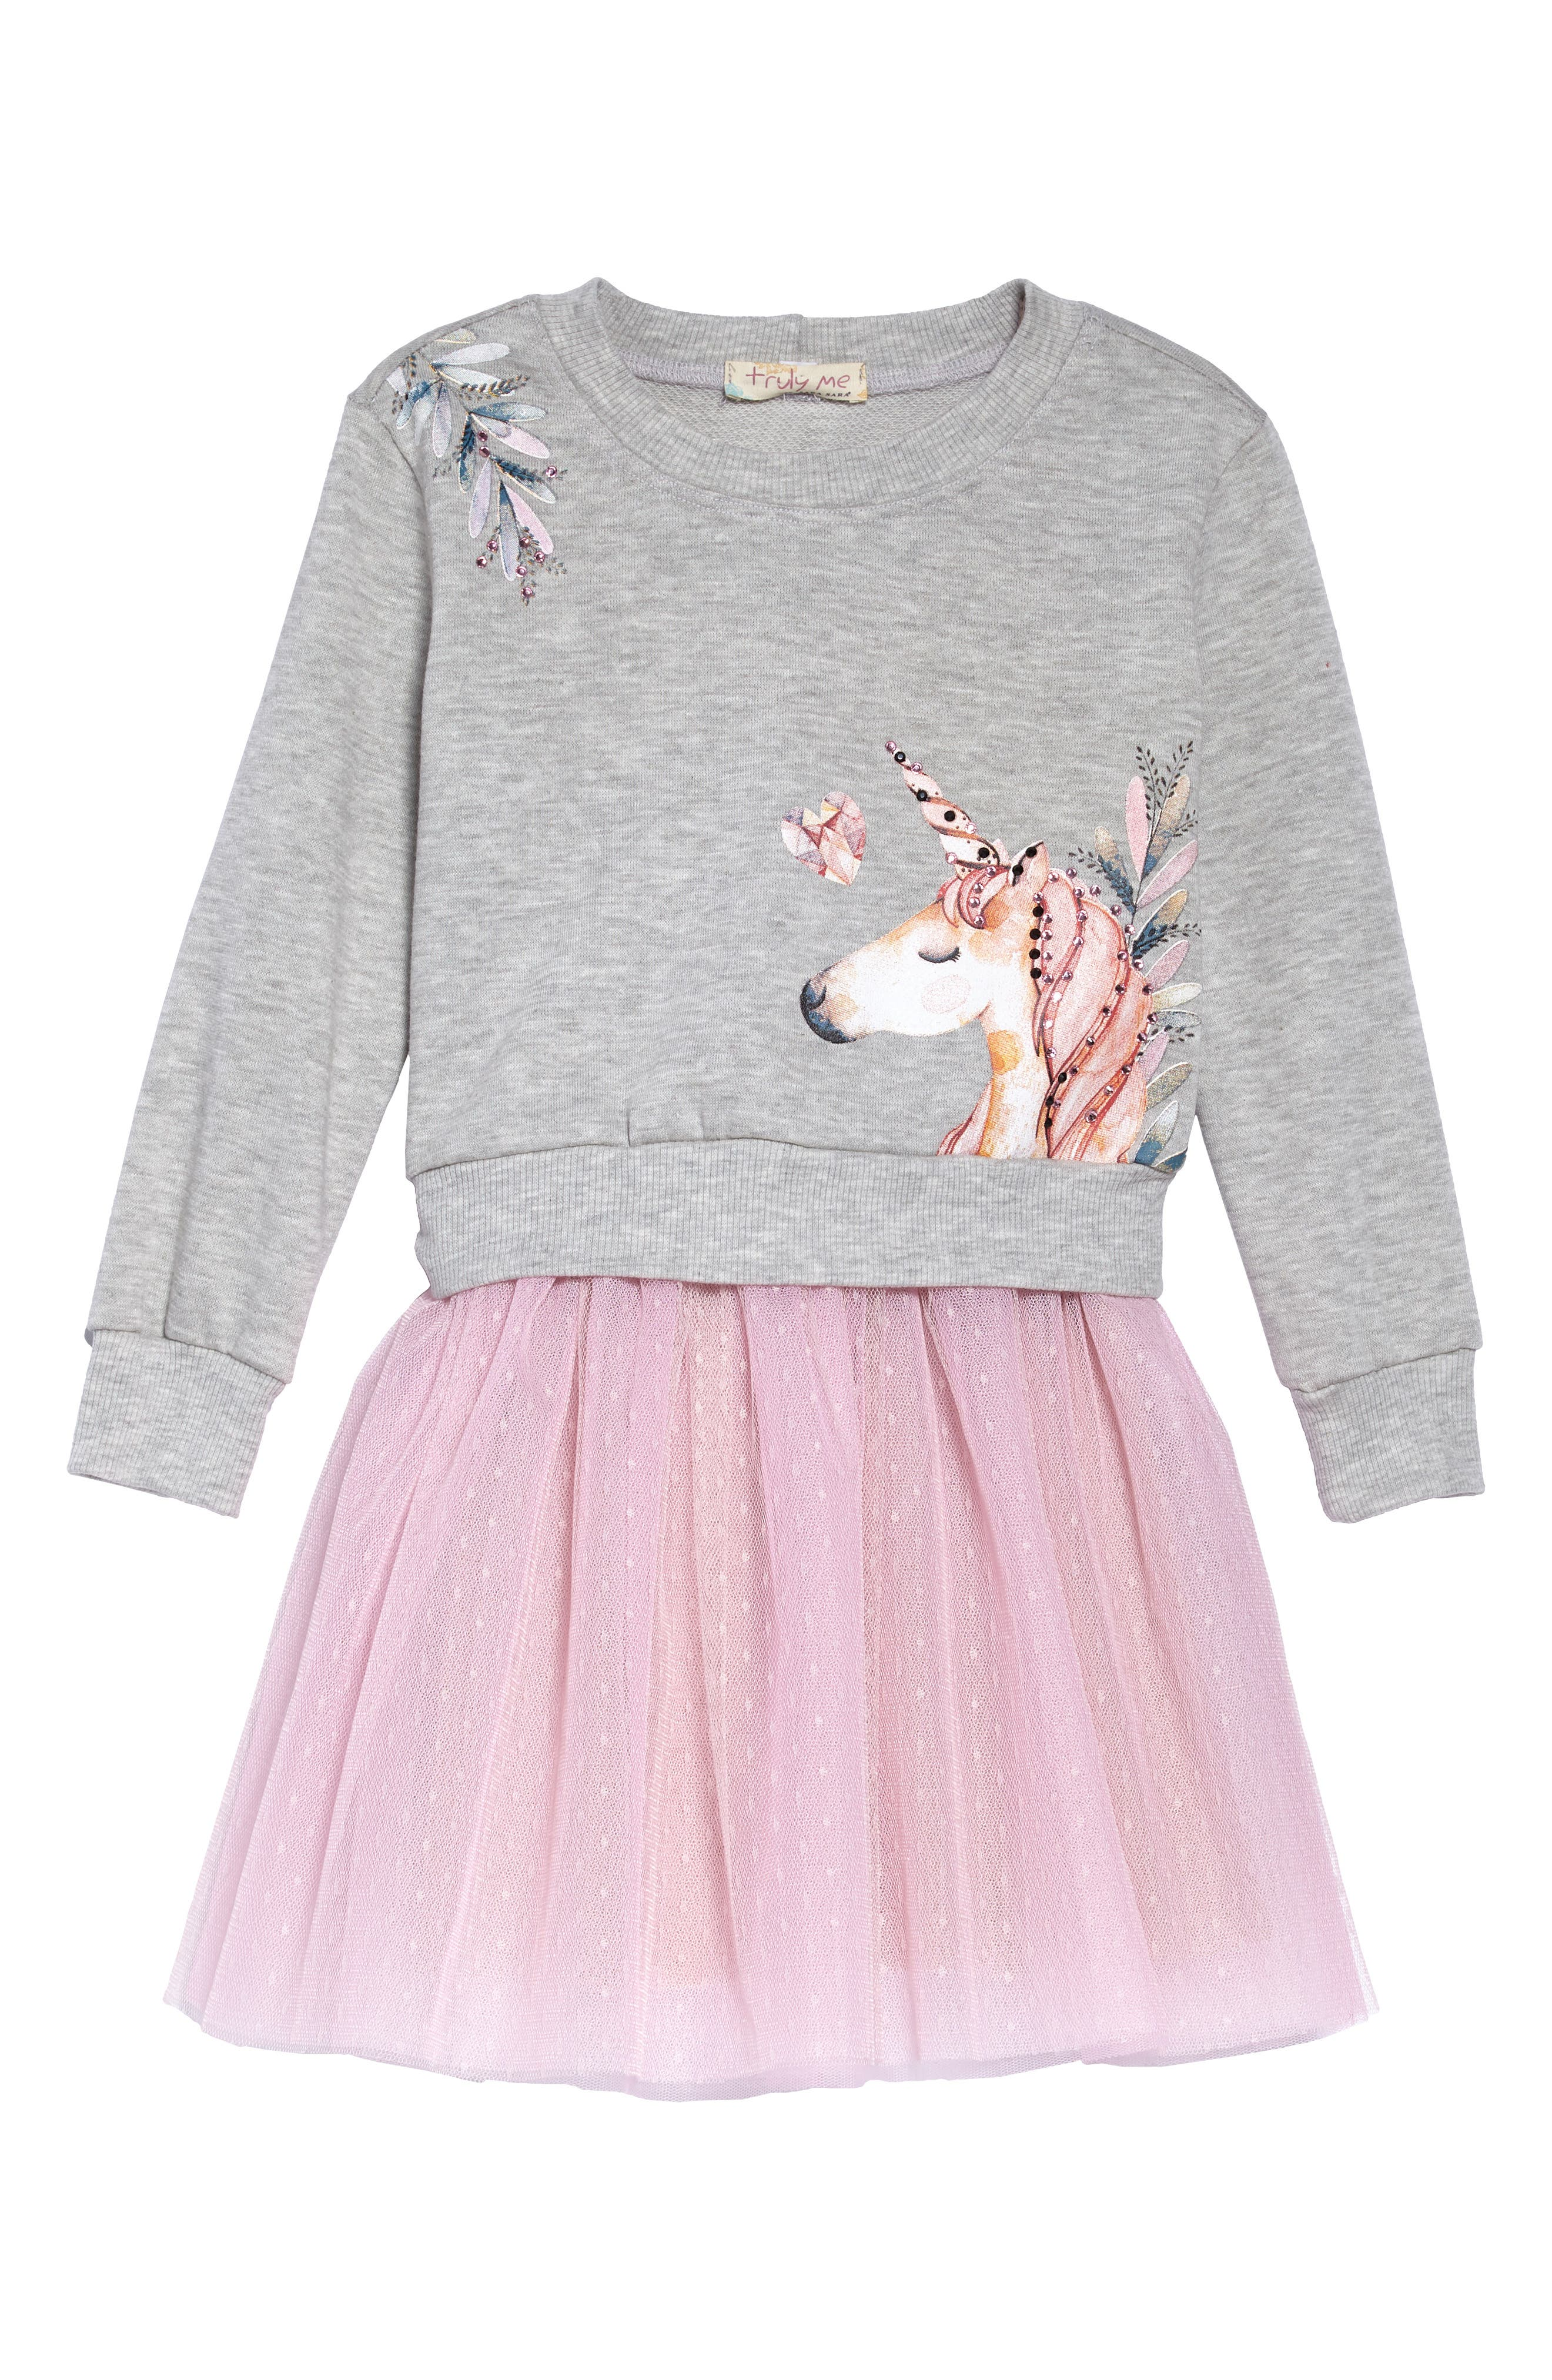 Unicorn Sweatshirt & Tutu Dress Set,                         Main,                         color, 069